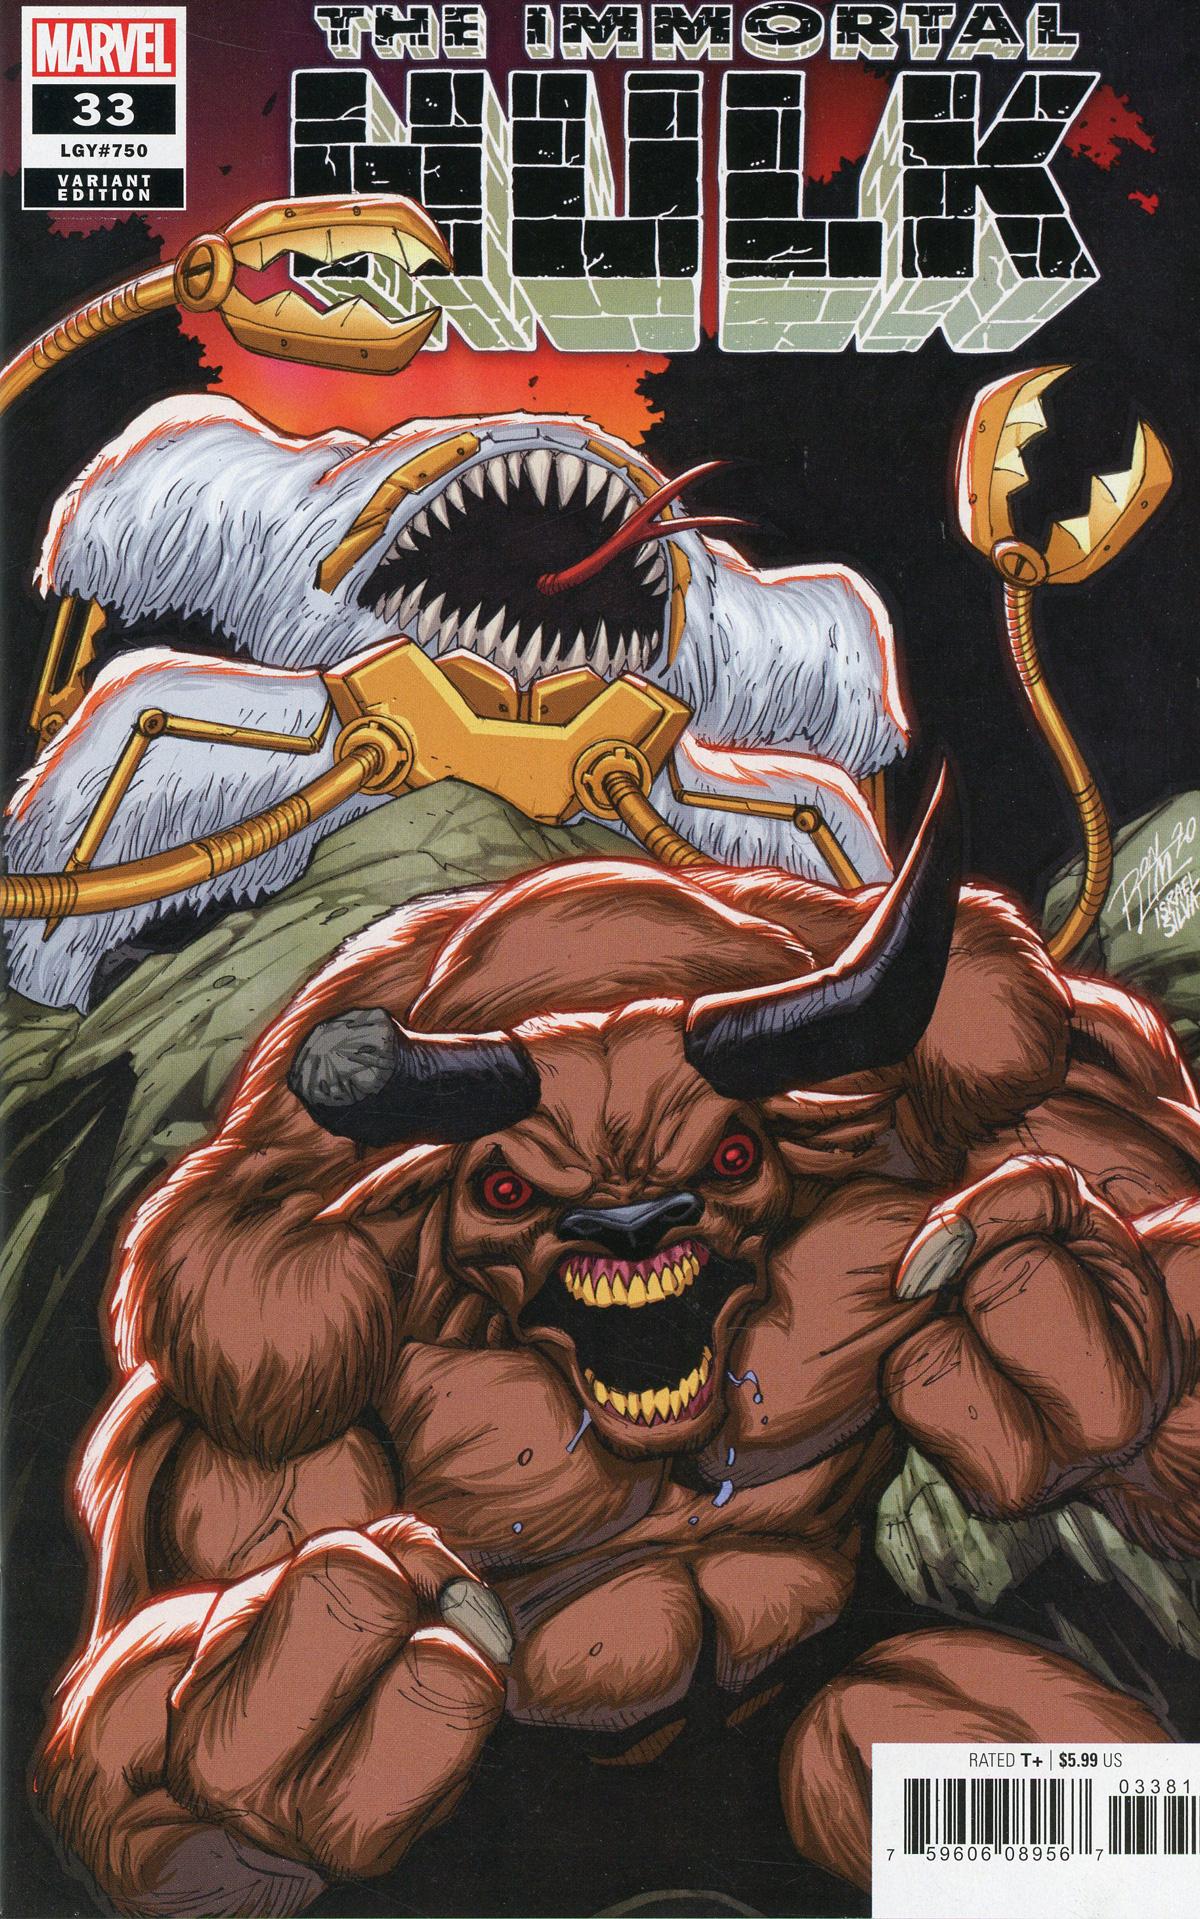 Immortal Hulk #33 Cover E Variant Ron Lim Cover (#750)